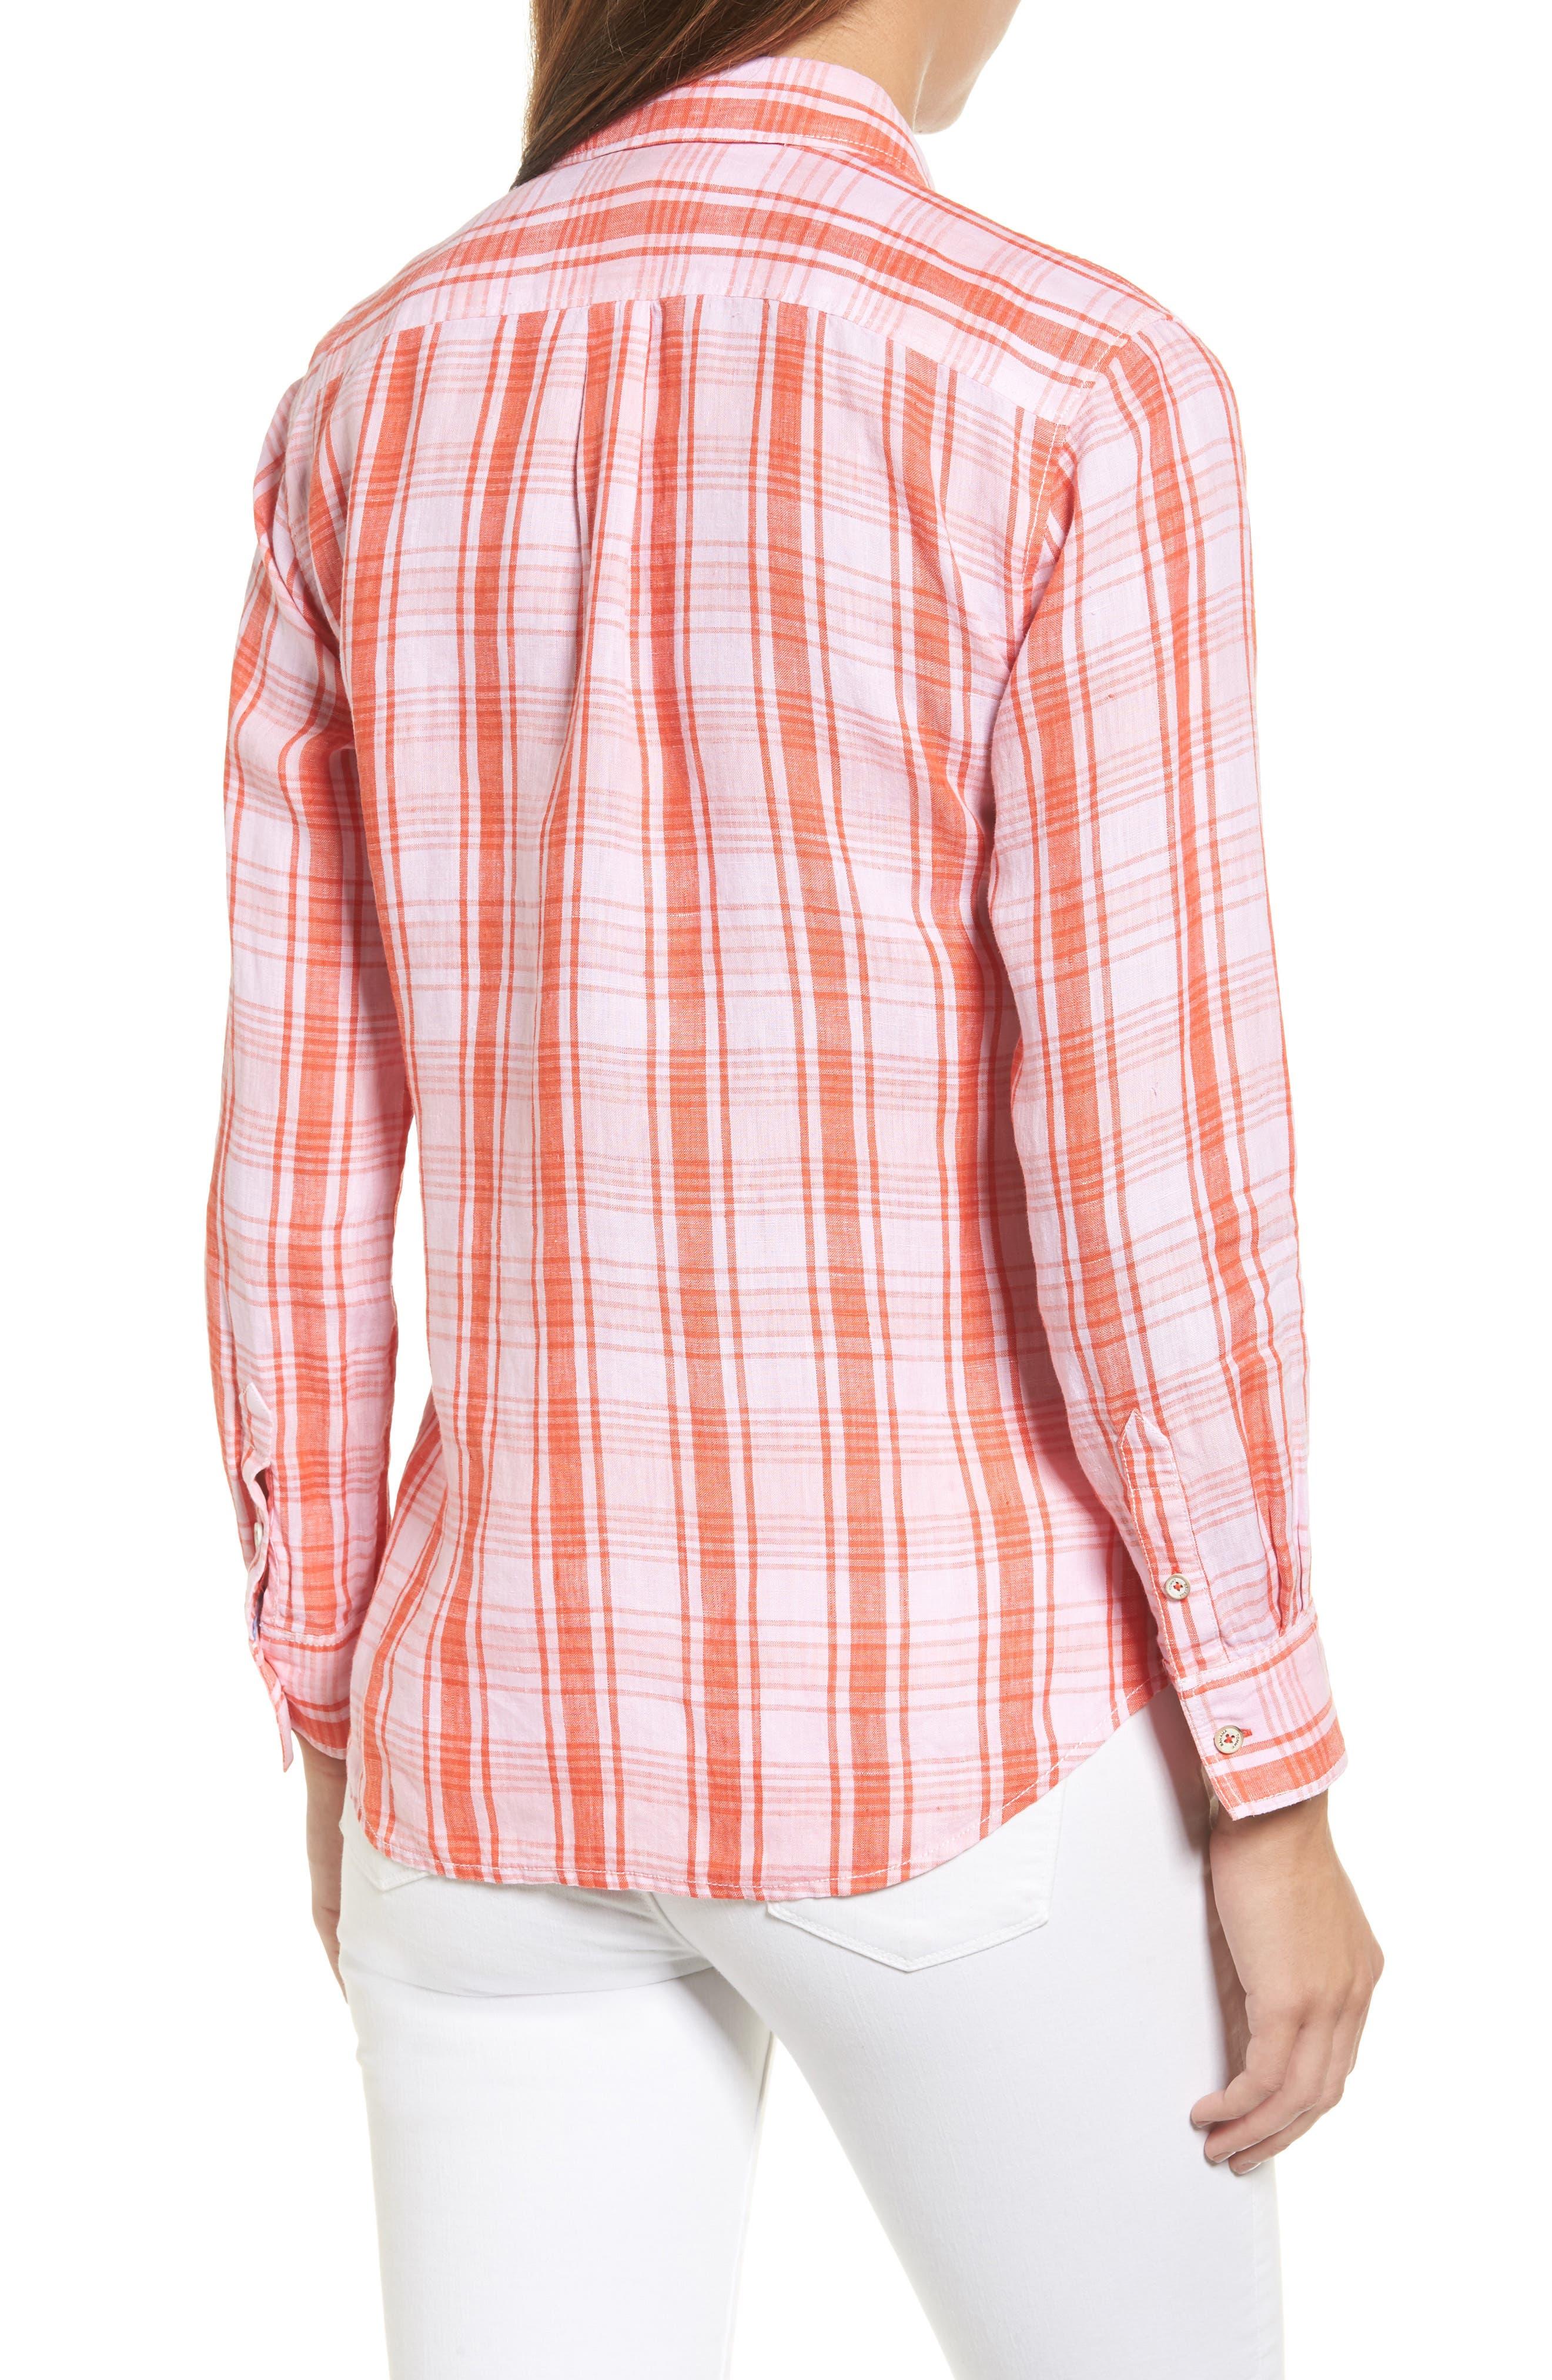 Athena Plaid Linen Shirt,                             Alternate thumbnail 2, color,                             800